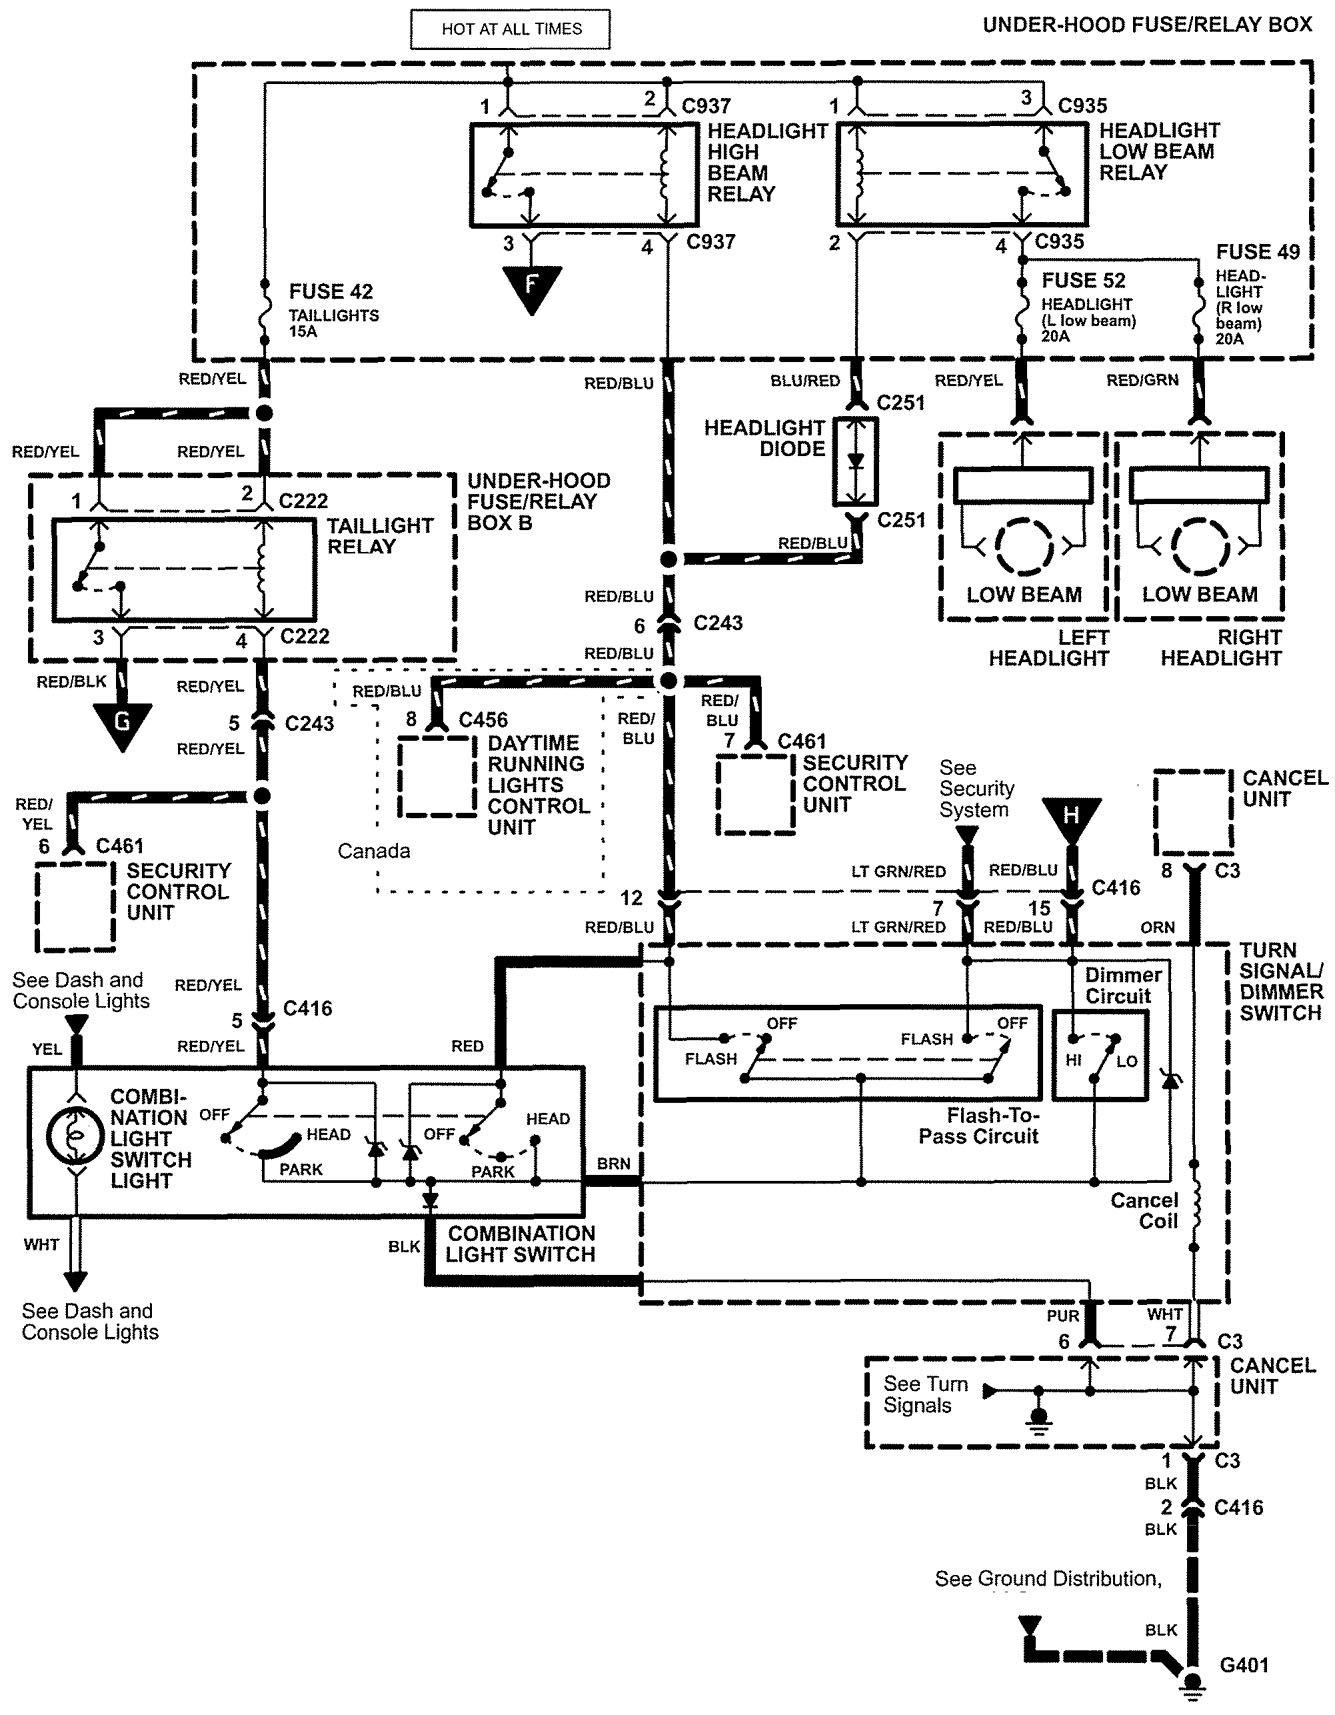 hight resolution of acura tail light wiring diagram yamaha dt3 wiring diagram acura integra headlight wiring diagram acura rsx headlight wiring diagram